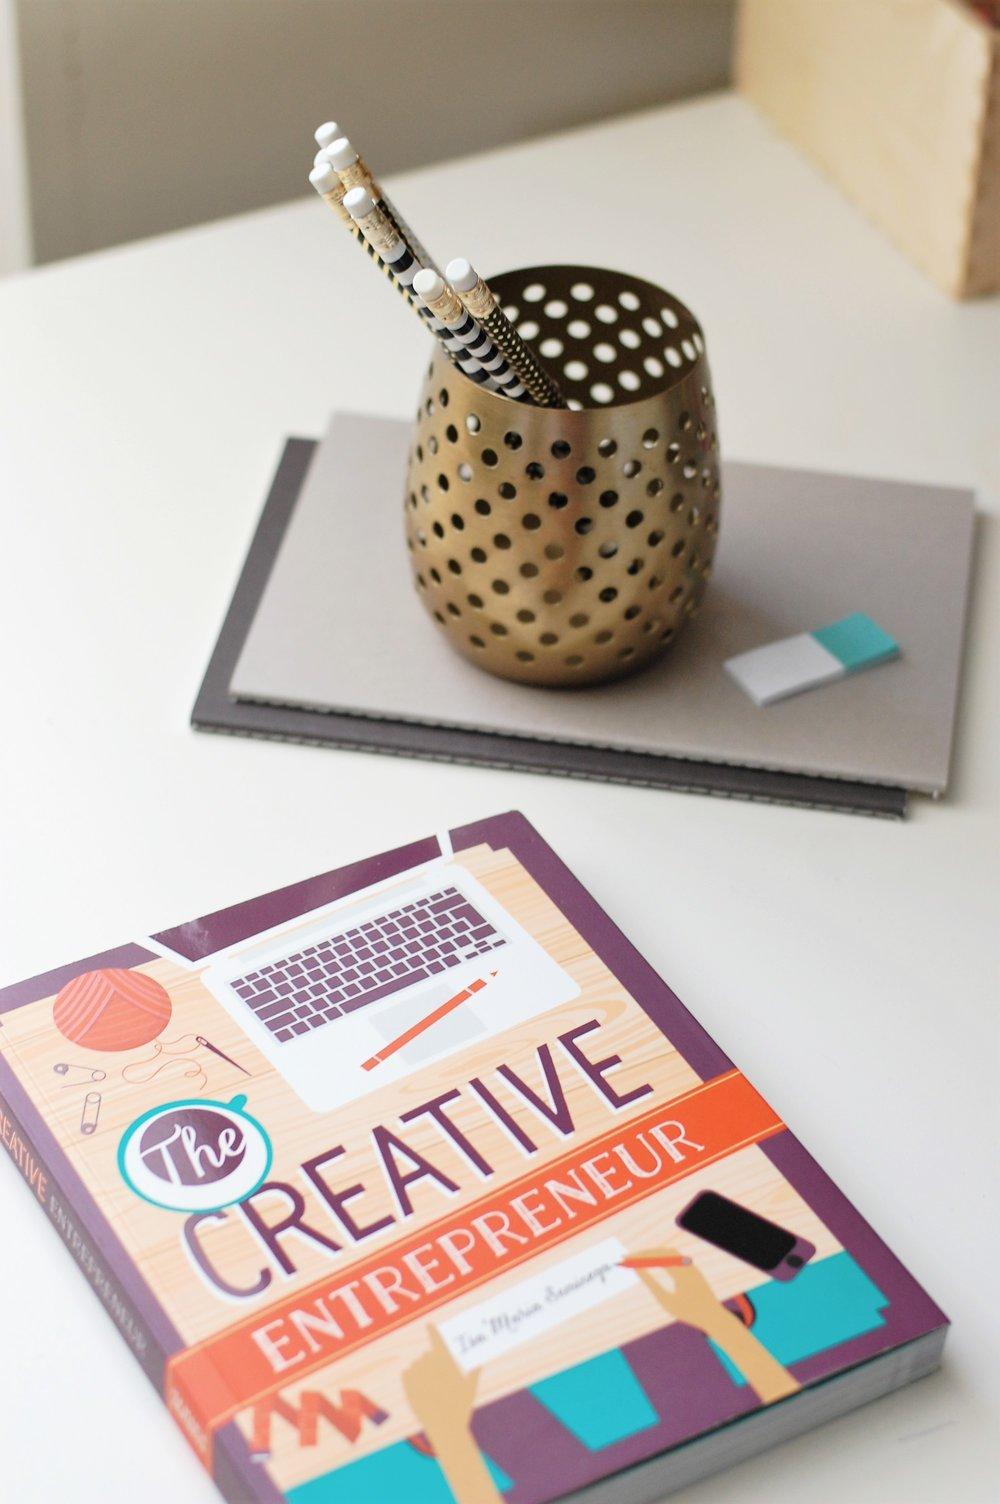 the-creative-entrepreneur-book.jpg